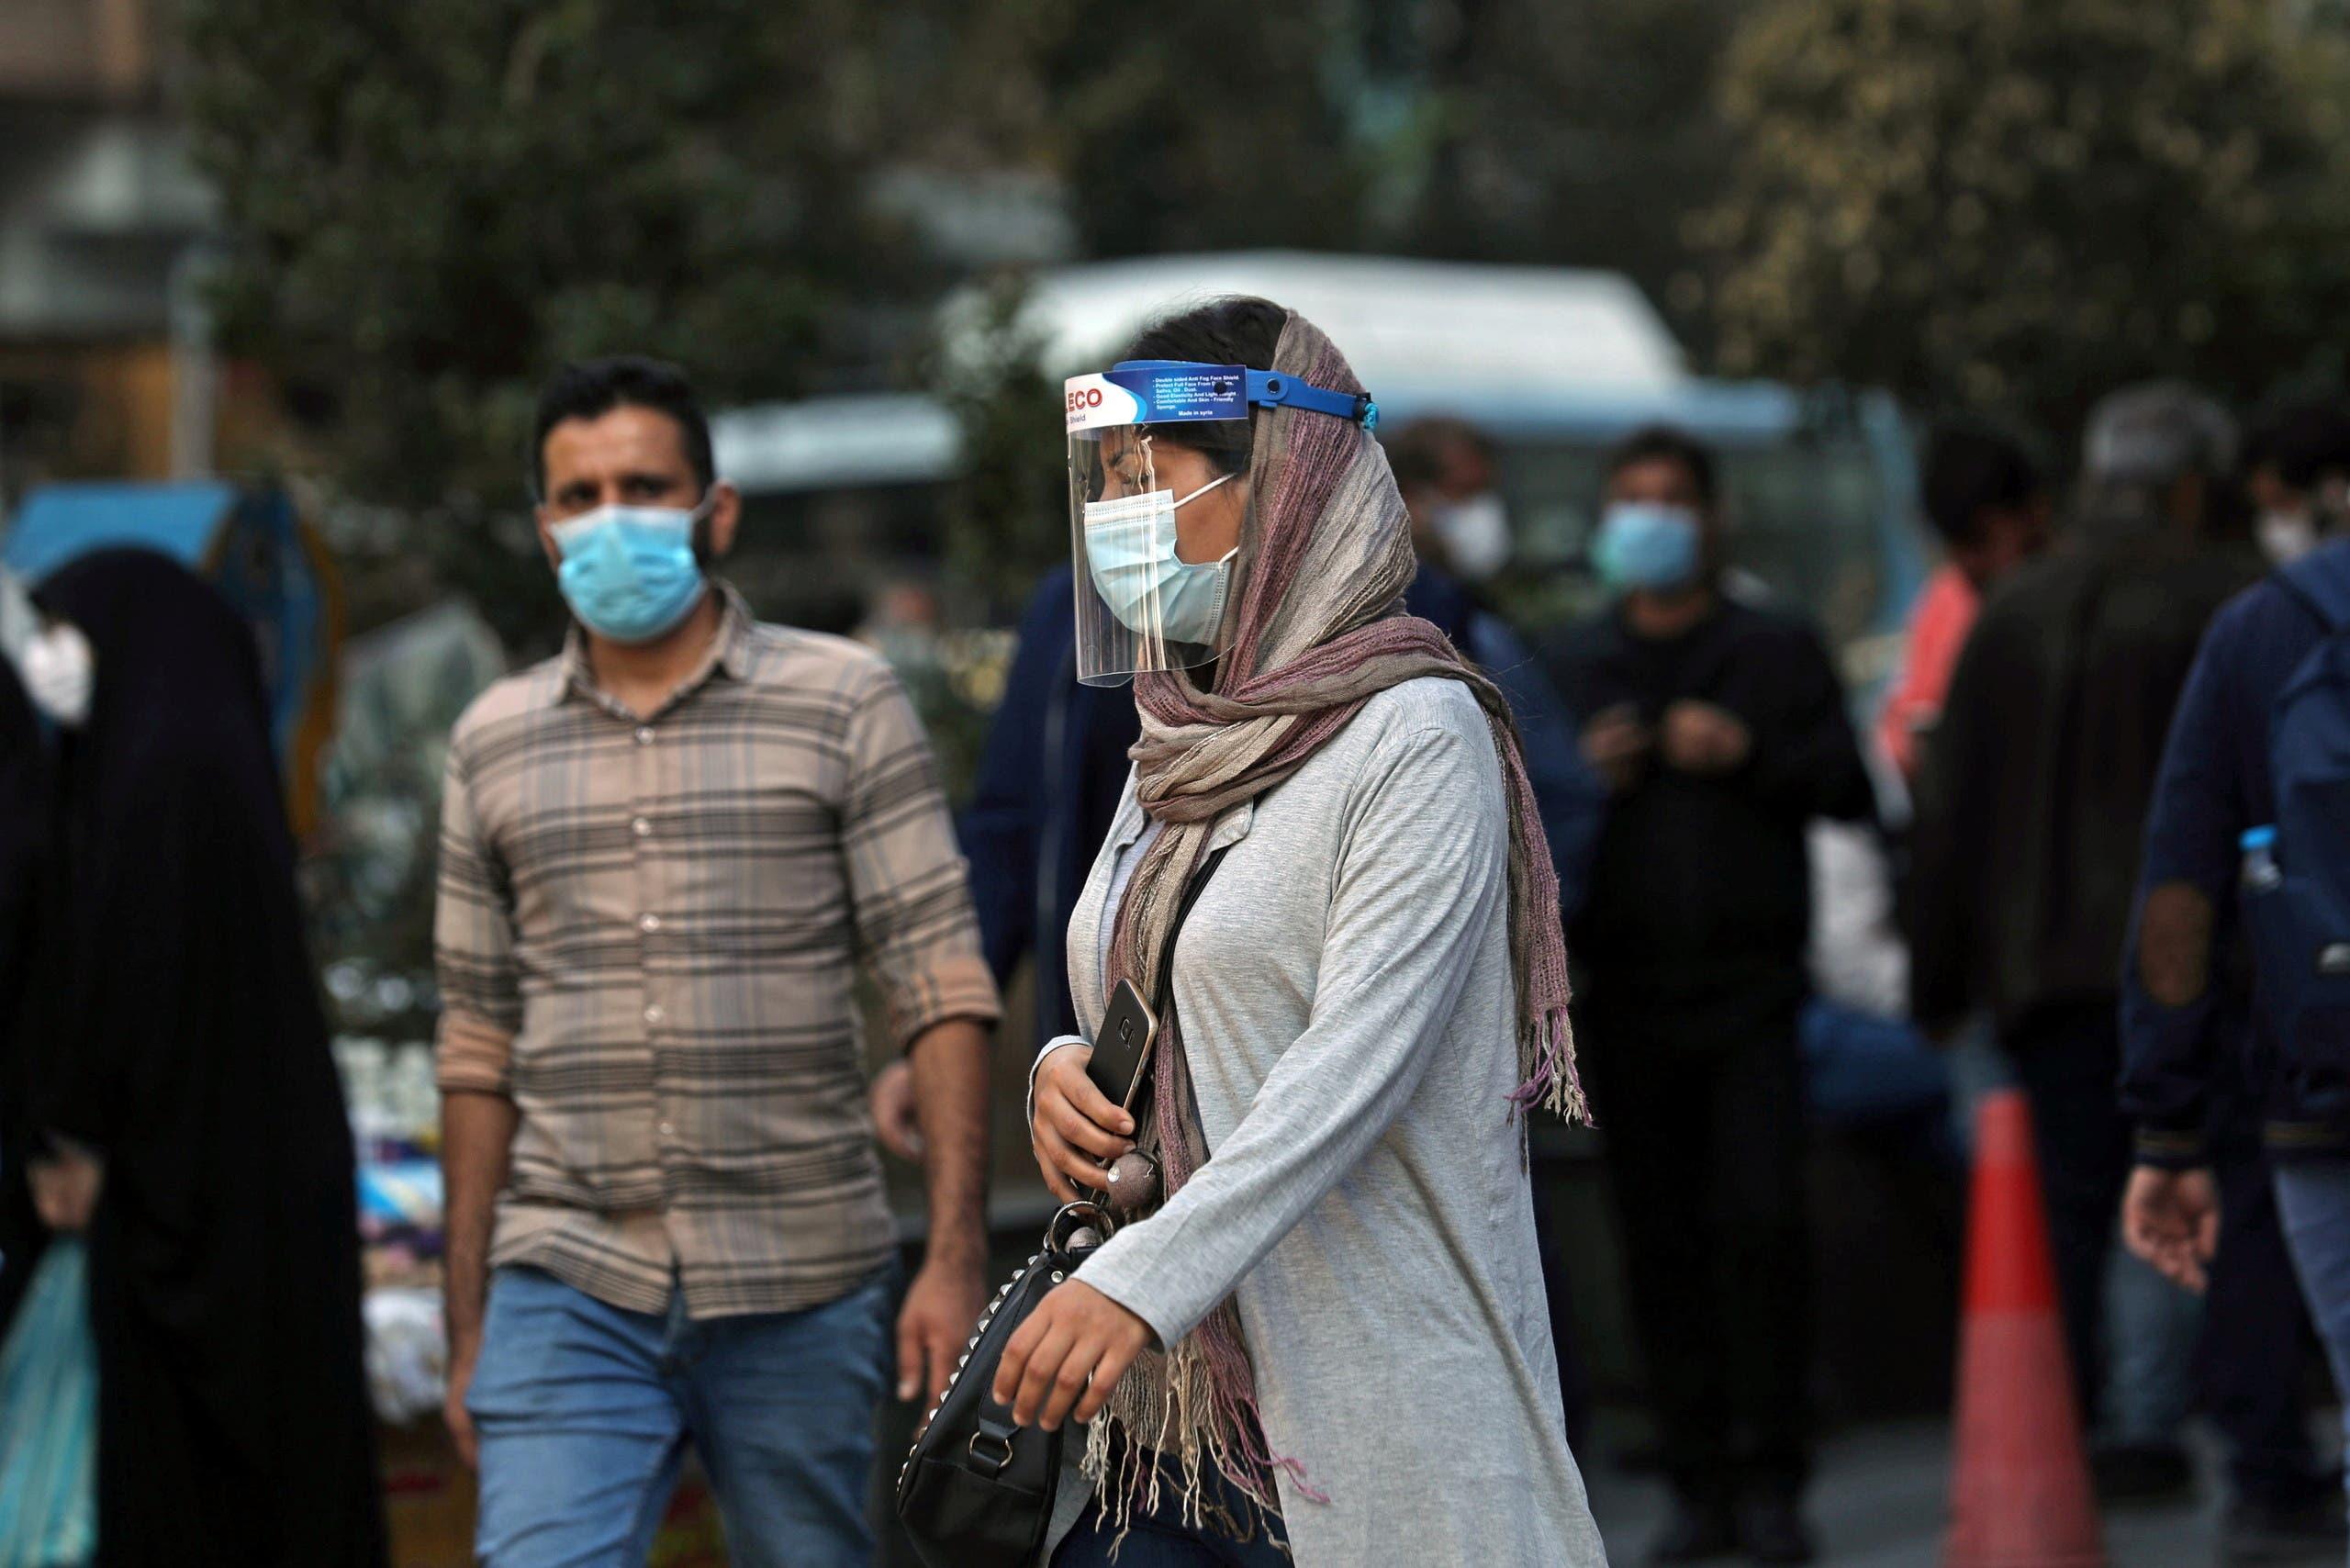 An Iranian woman wears a mask and face shield in Tehran, Iran October 24, 2020. (Majid Asgaripour/WANA via Reuters)